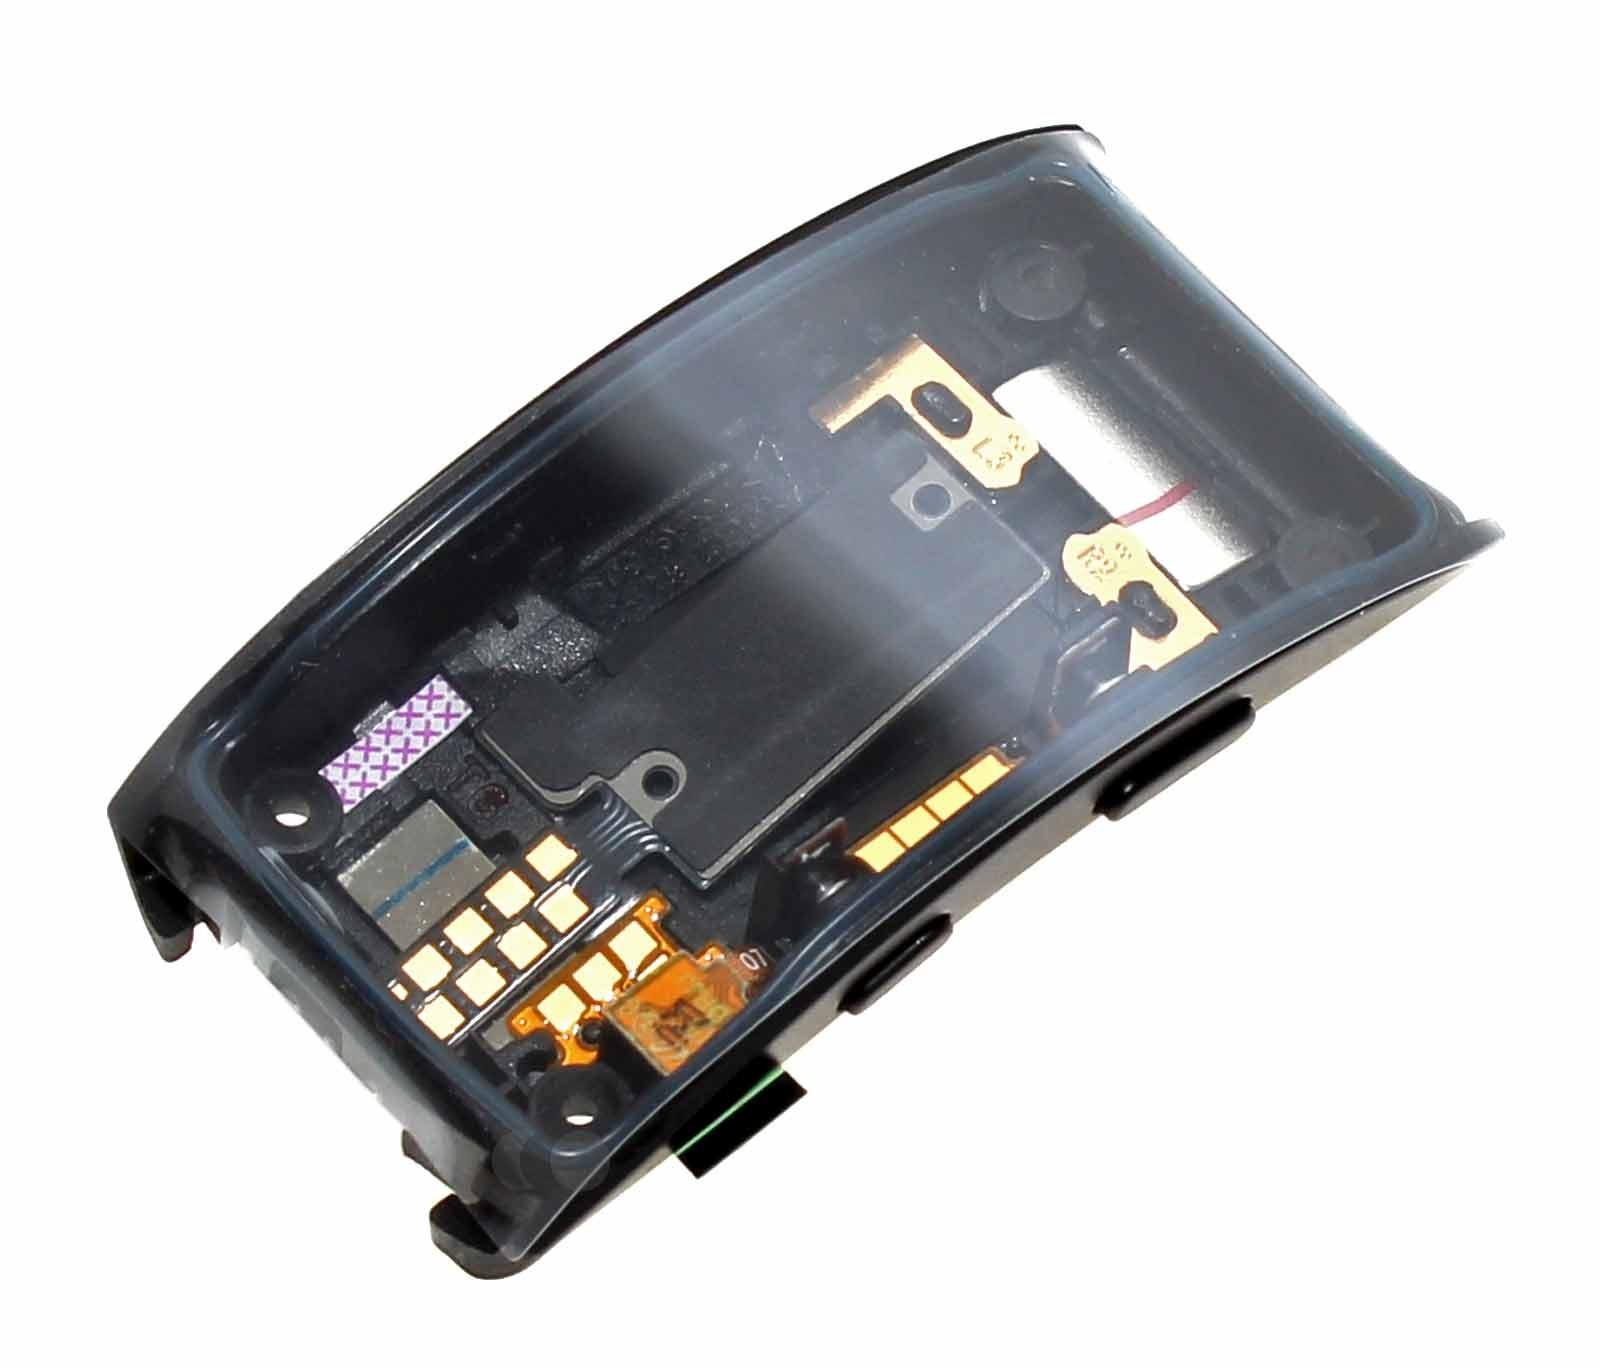 Samsung Gear Fit 2 Pro (SM-R365) Akkudeckel Gehäuse Rückseite, schwarz, GH82-15064A, Back Cover